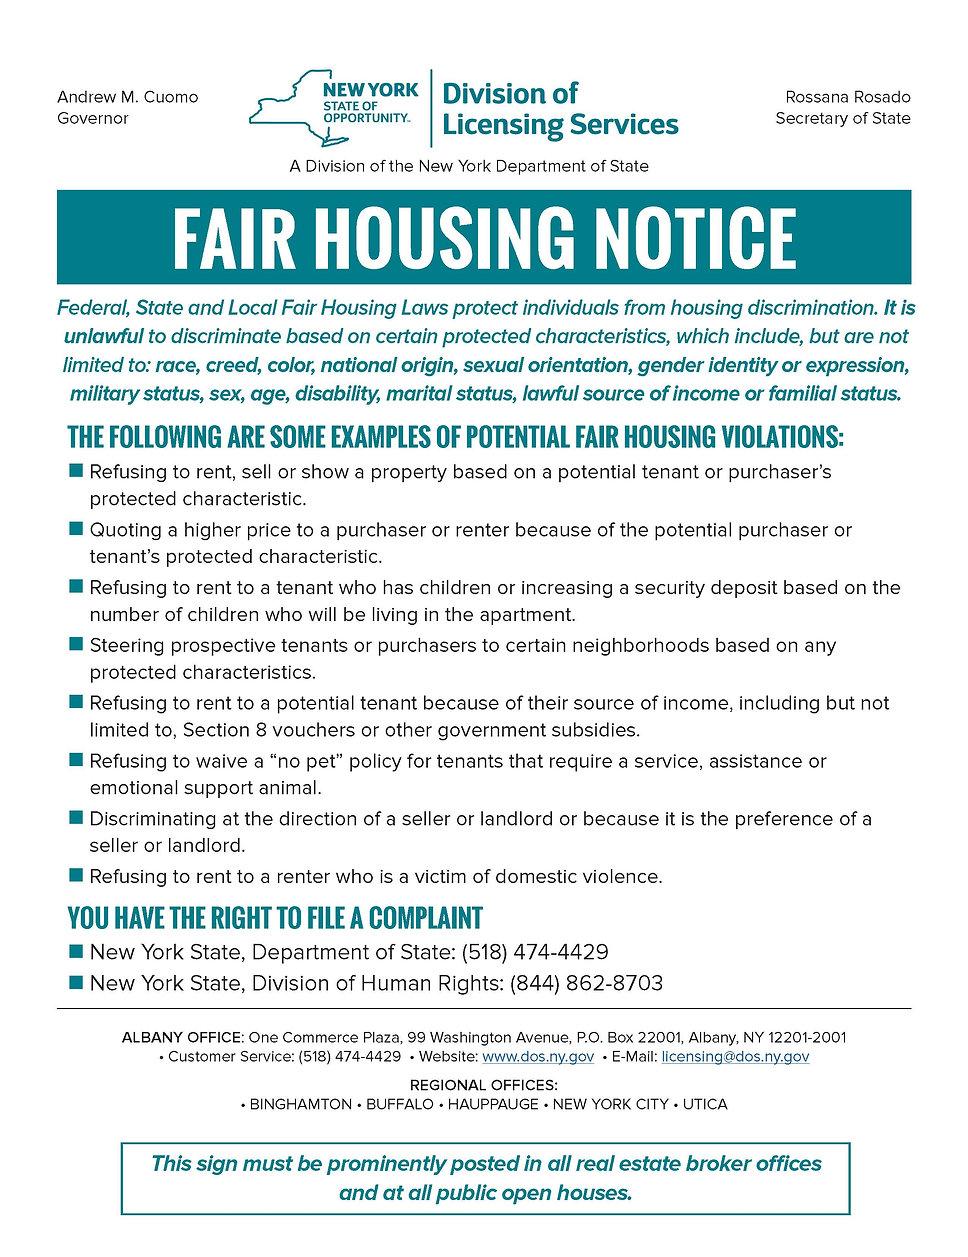 fairhousingnotice_new(3).jpg